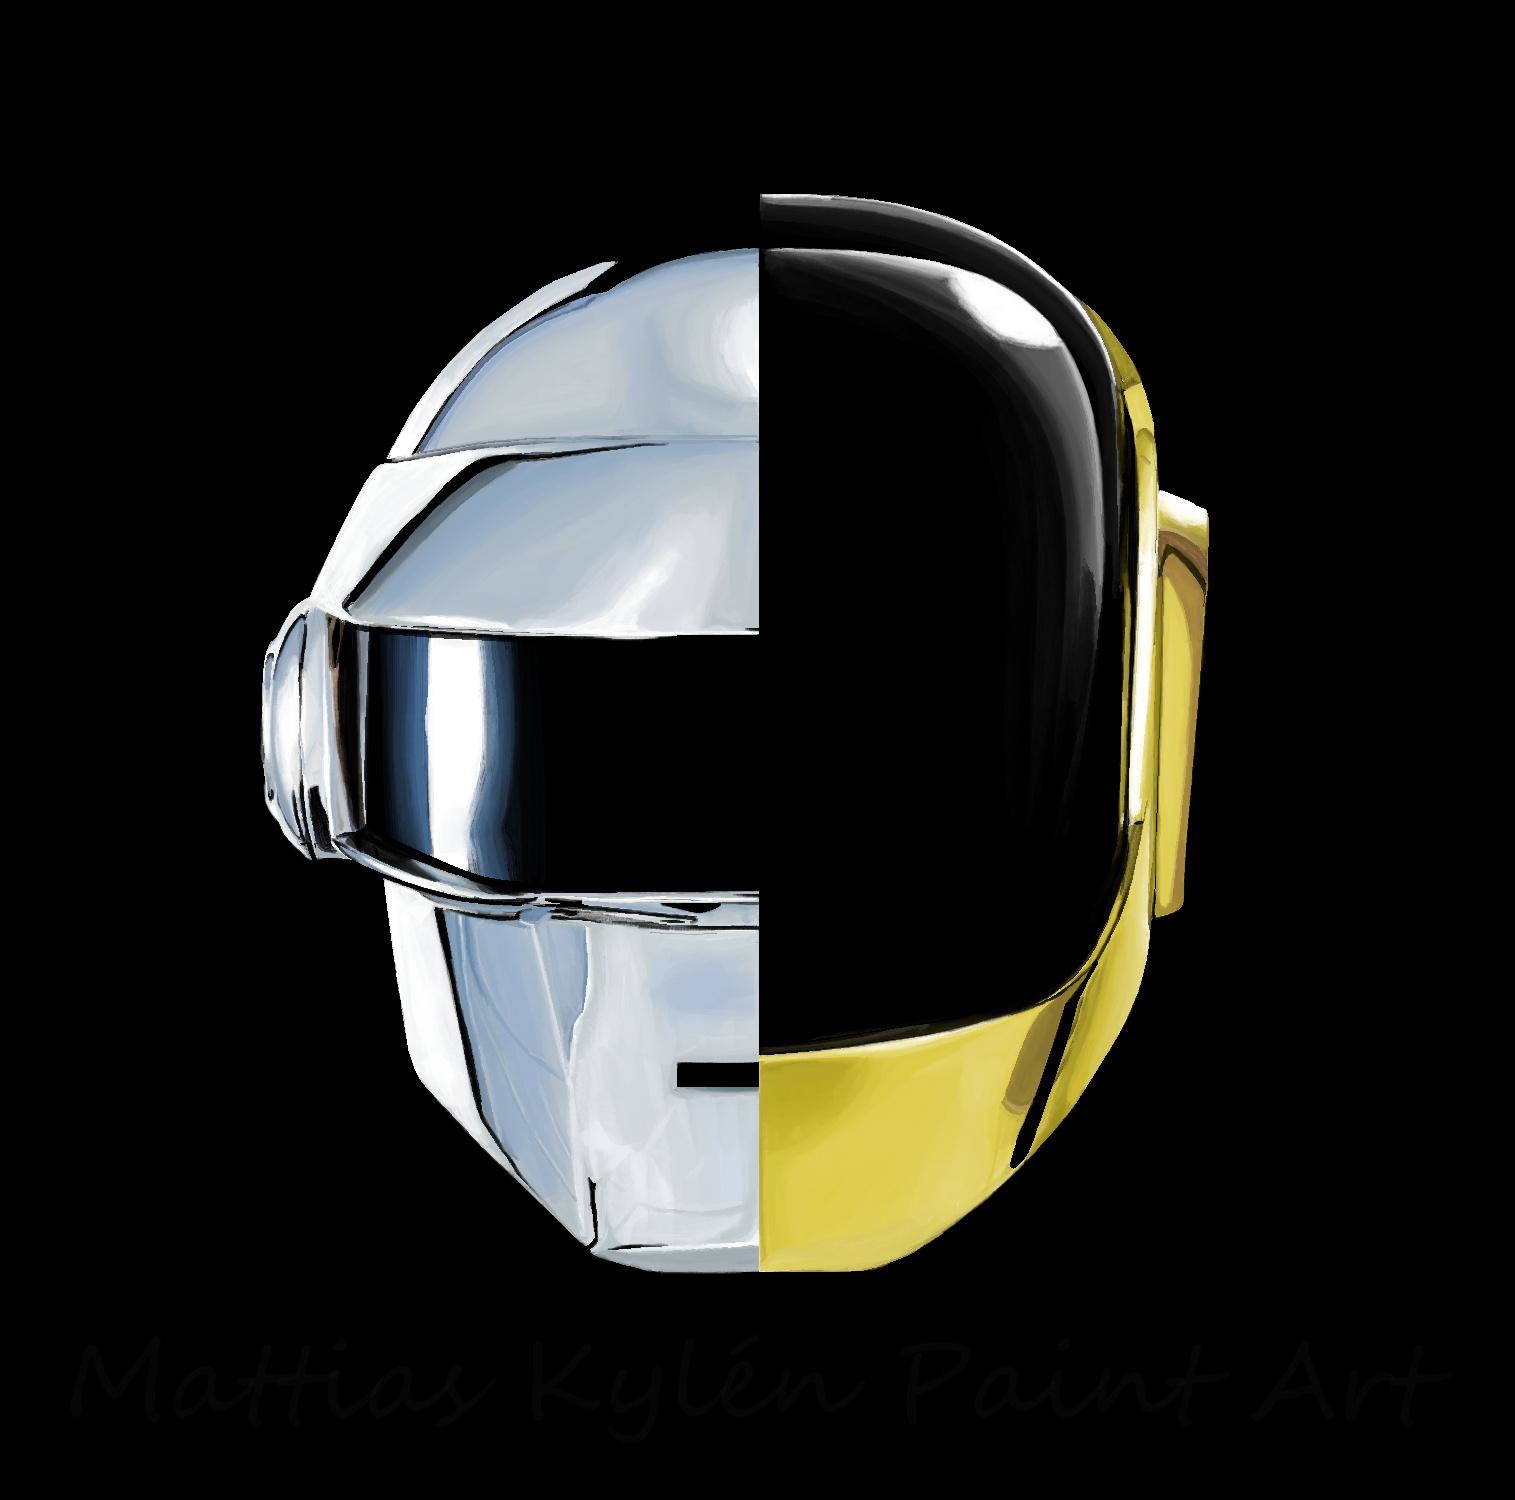 Ms Paint : Daft Punk